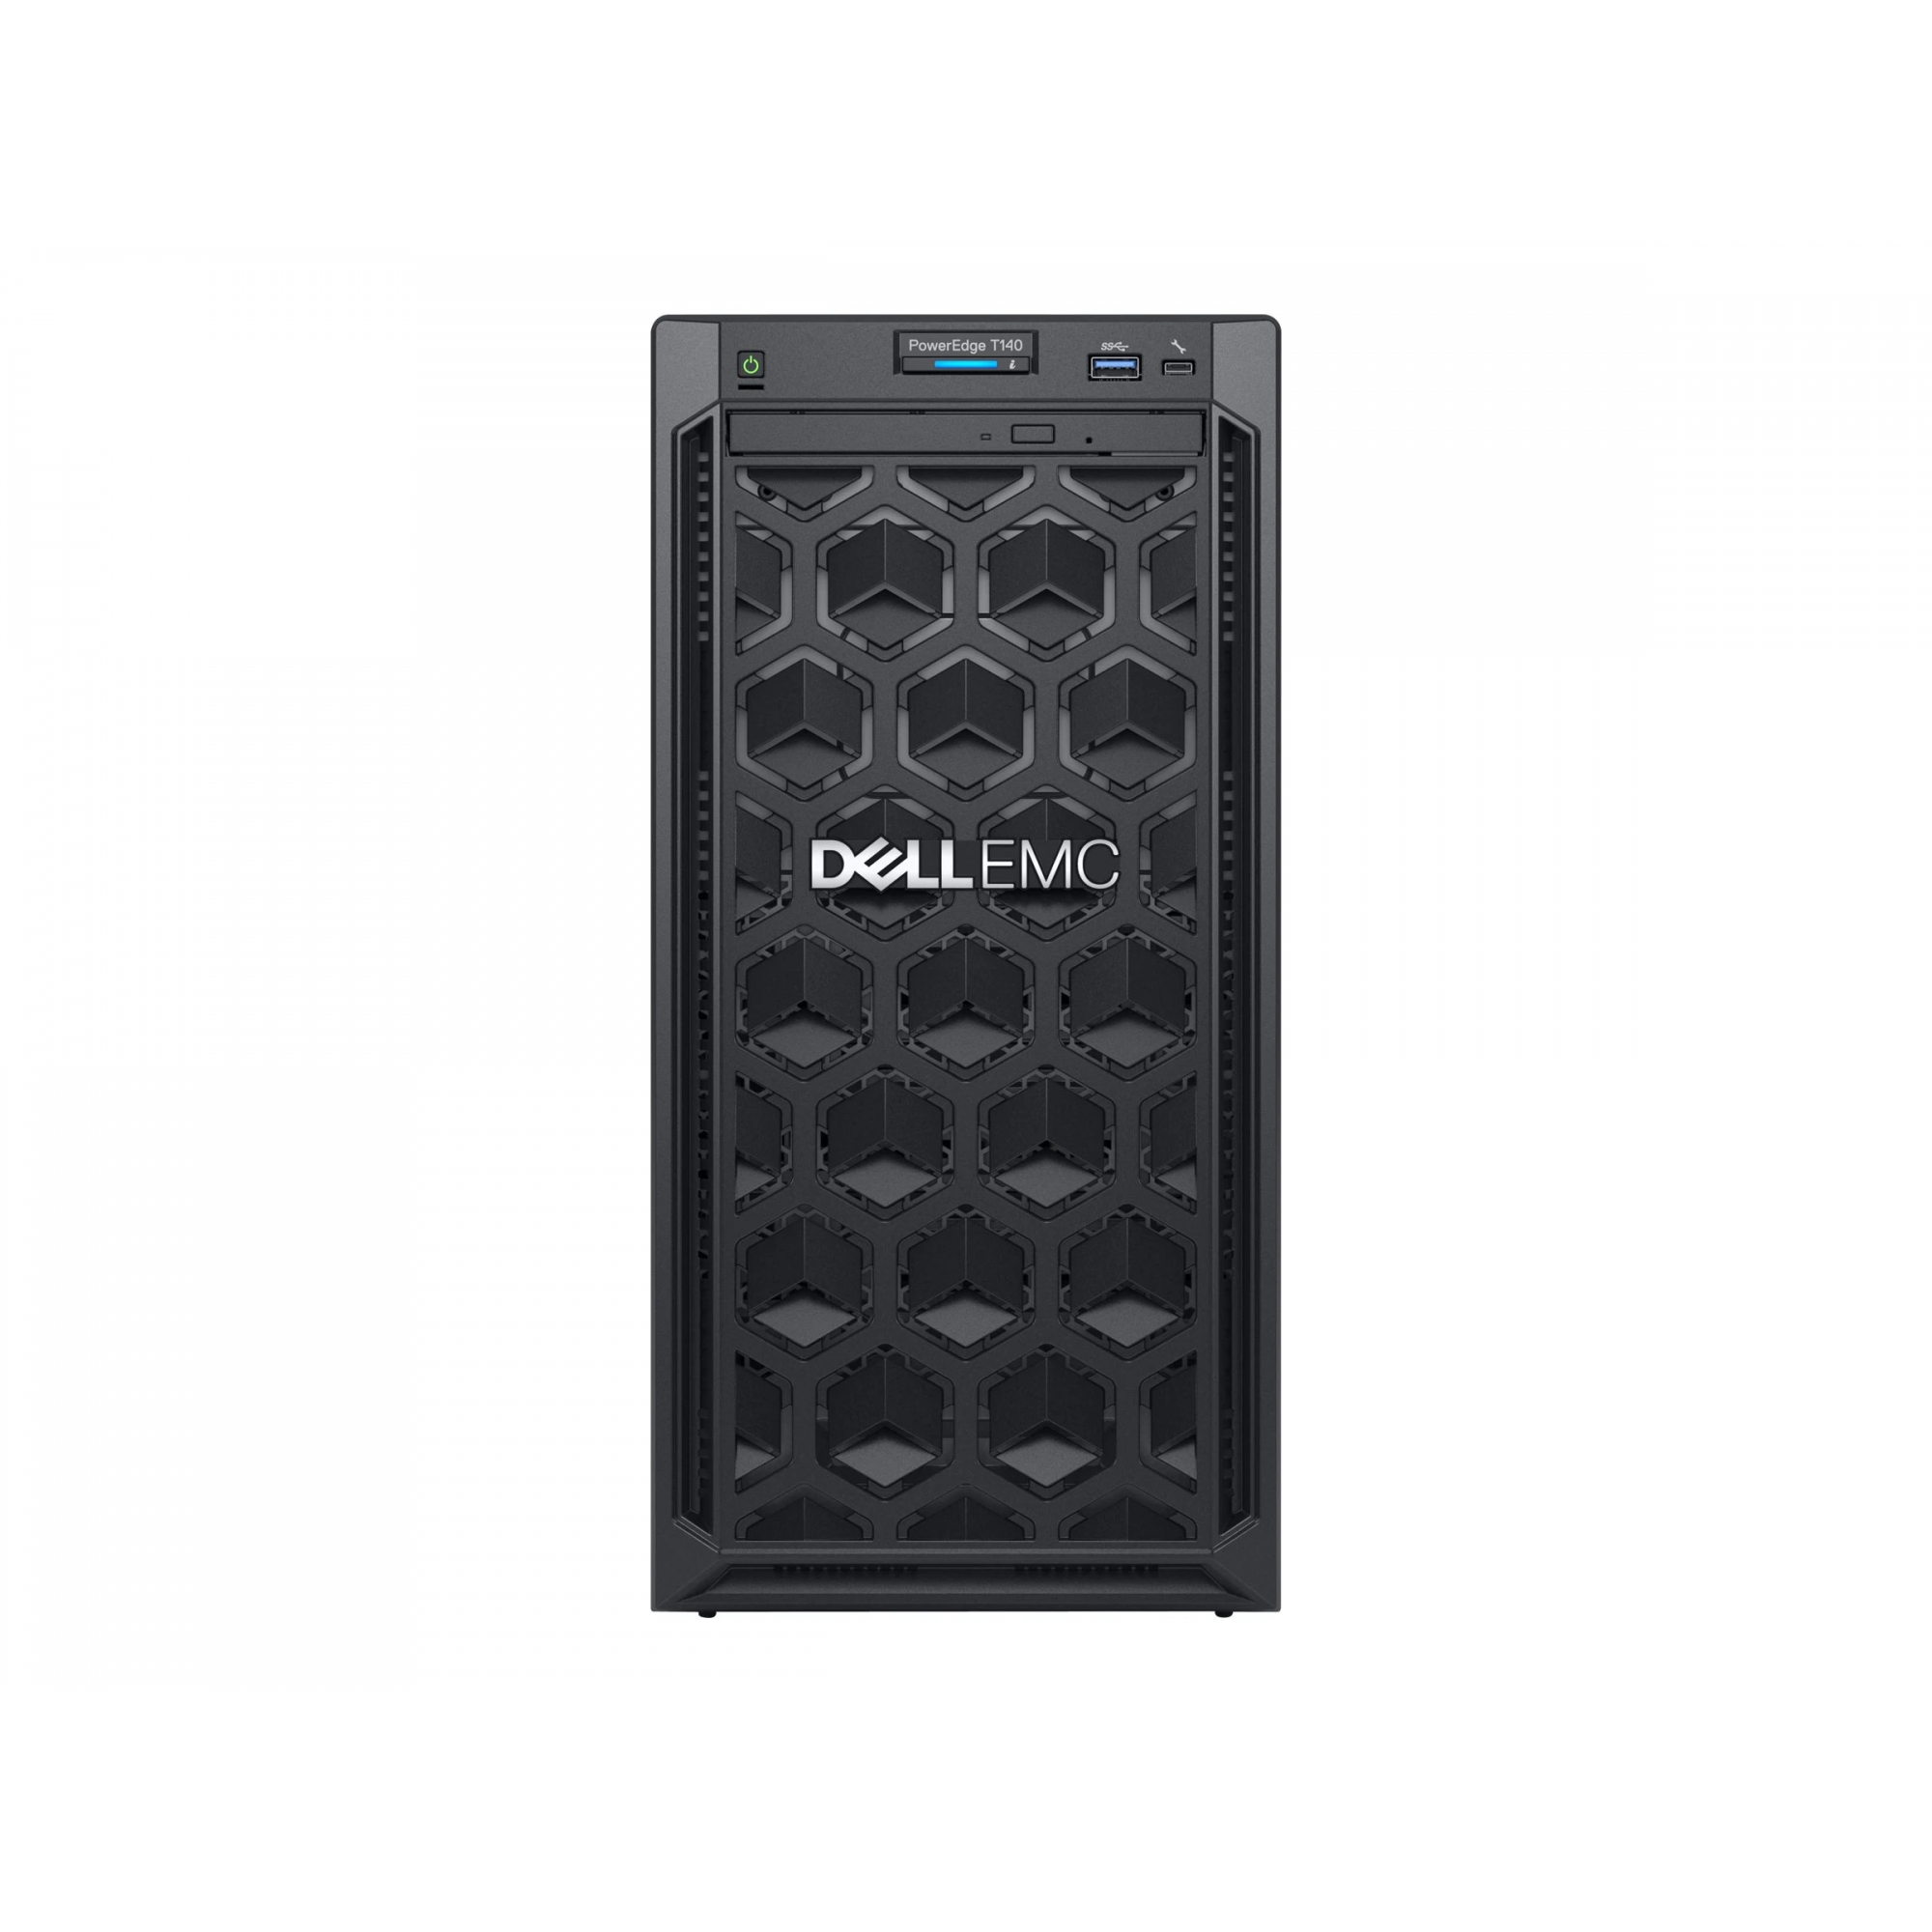 Servidor Dell Poweredge T140 E-2244G/16Gb/2X 1Tb/DVD-RW/Win Server 2019 Essentials/Garantia 5 anos